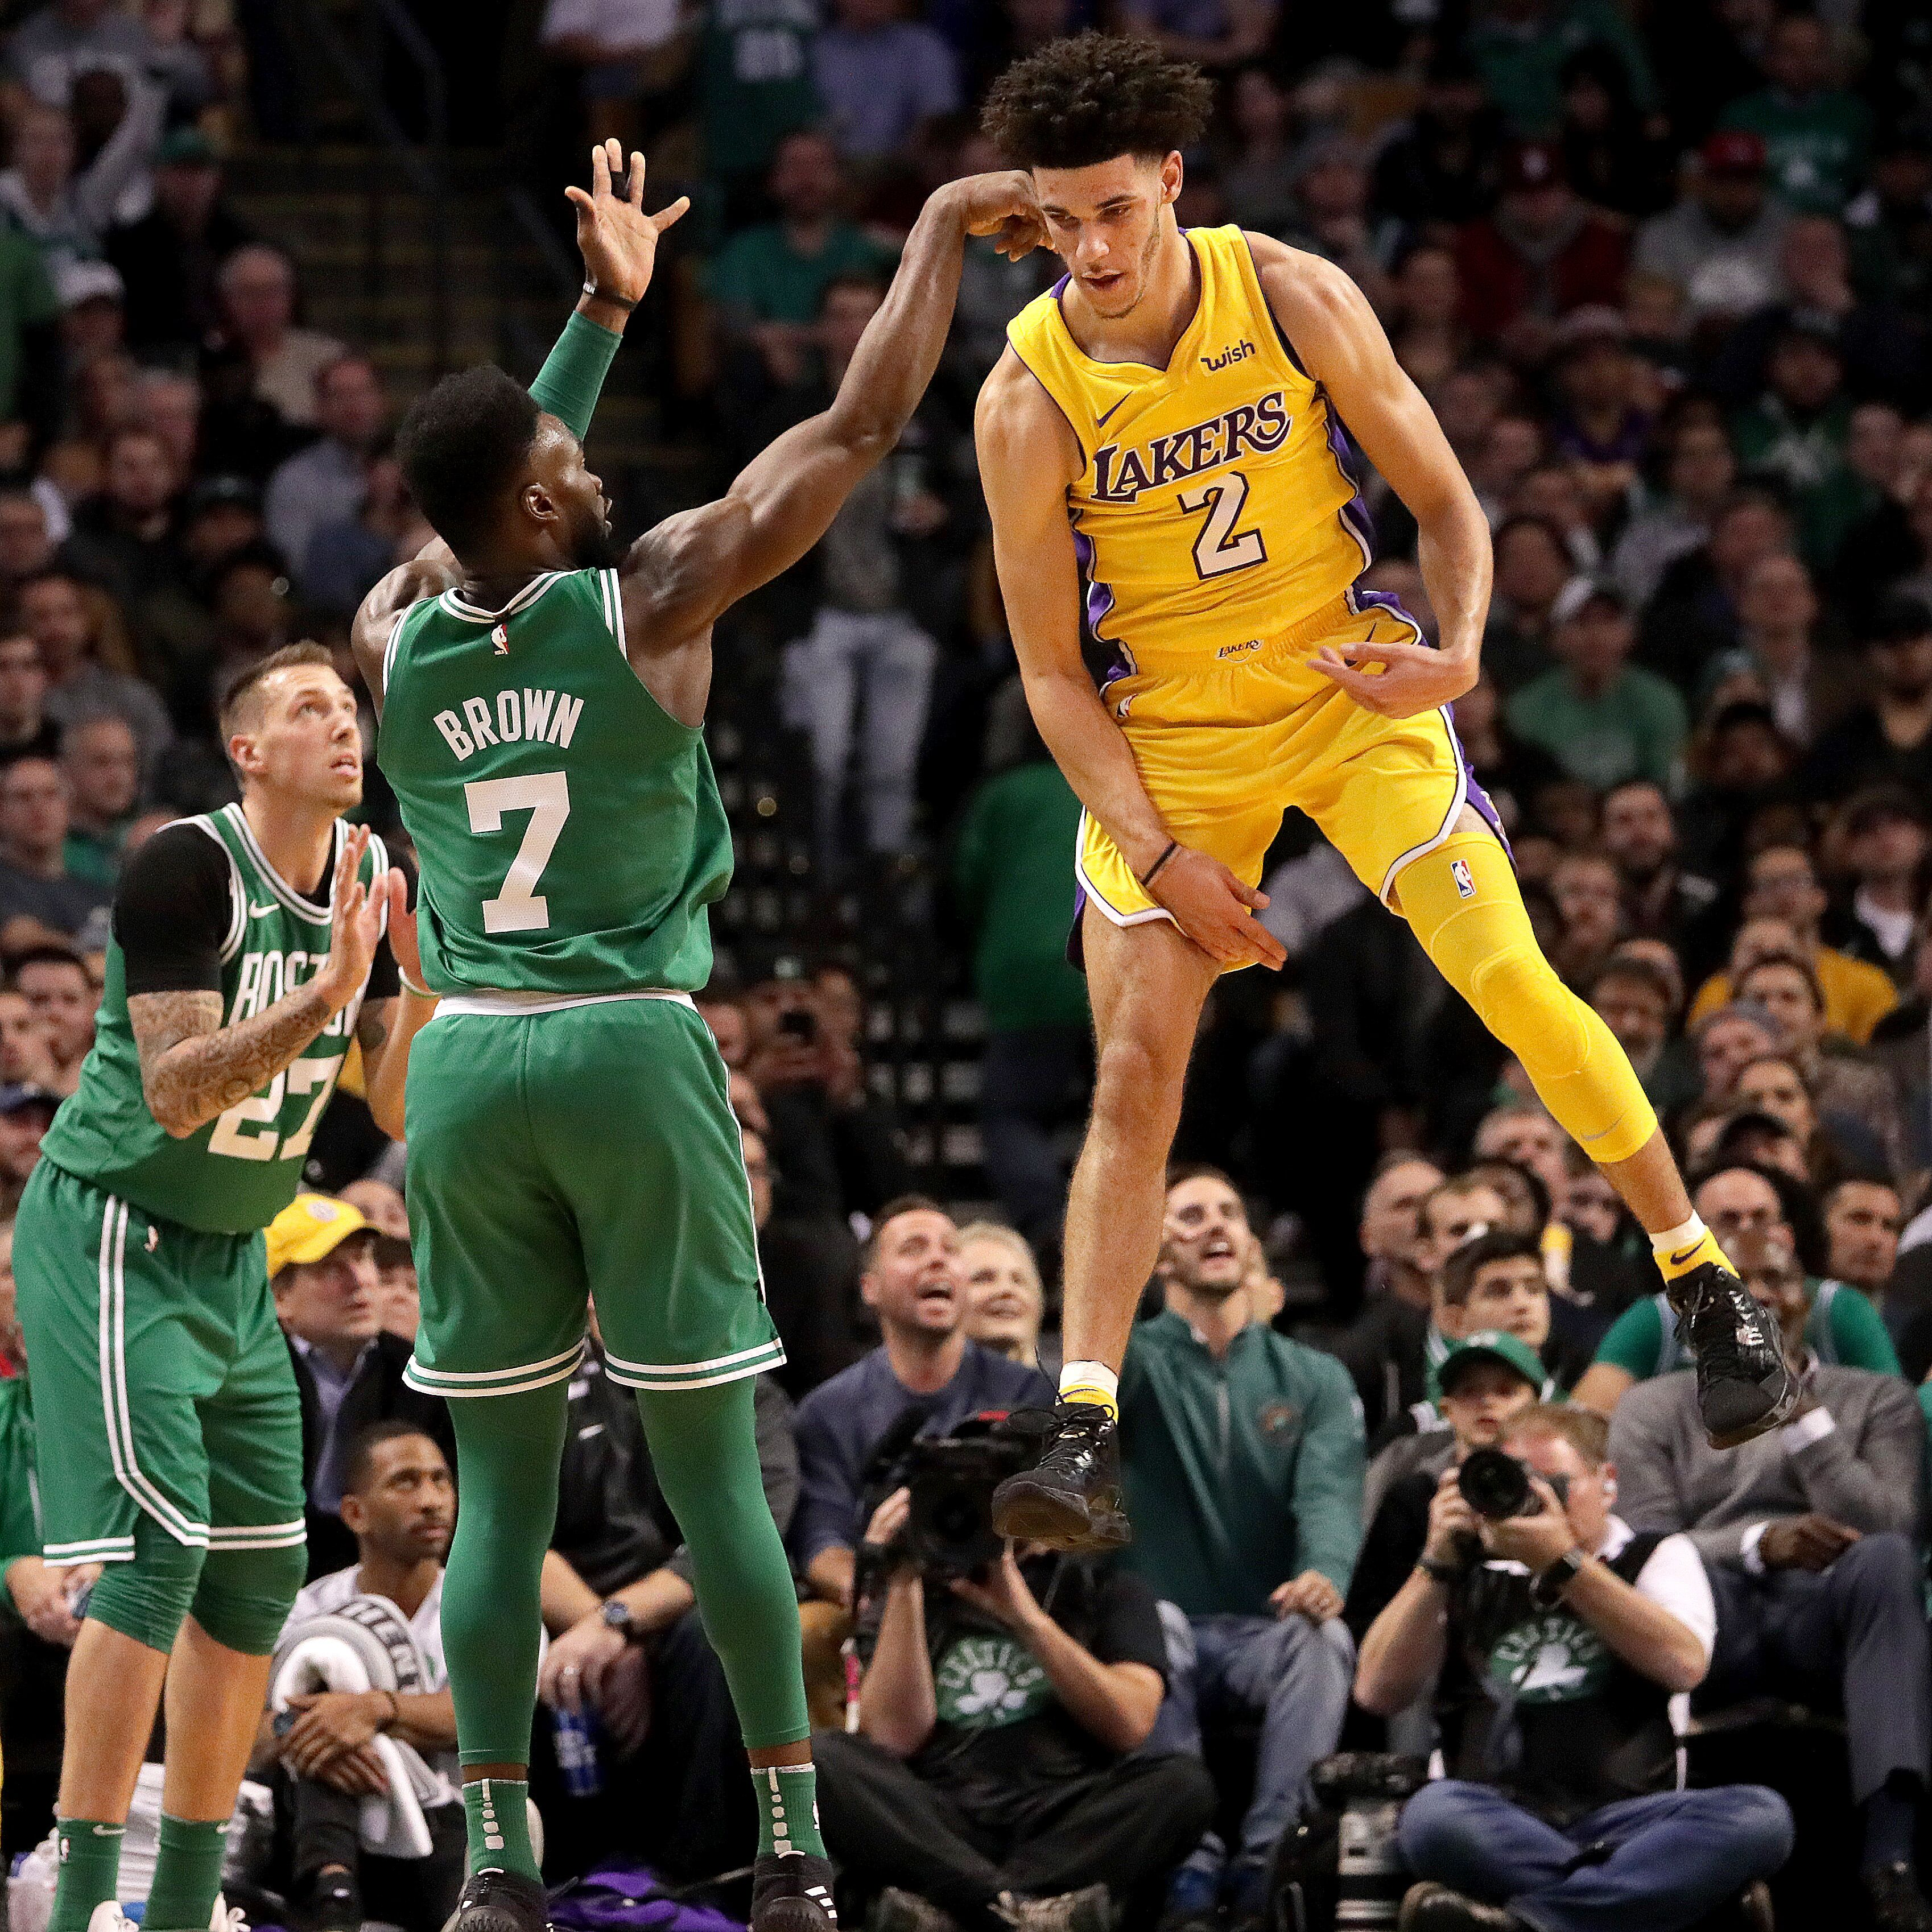 Los Angeles Lakers: The Latest Boston Celtics News